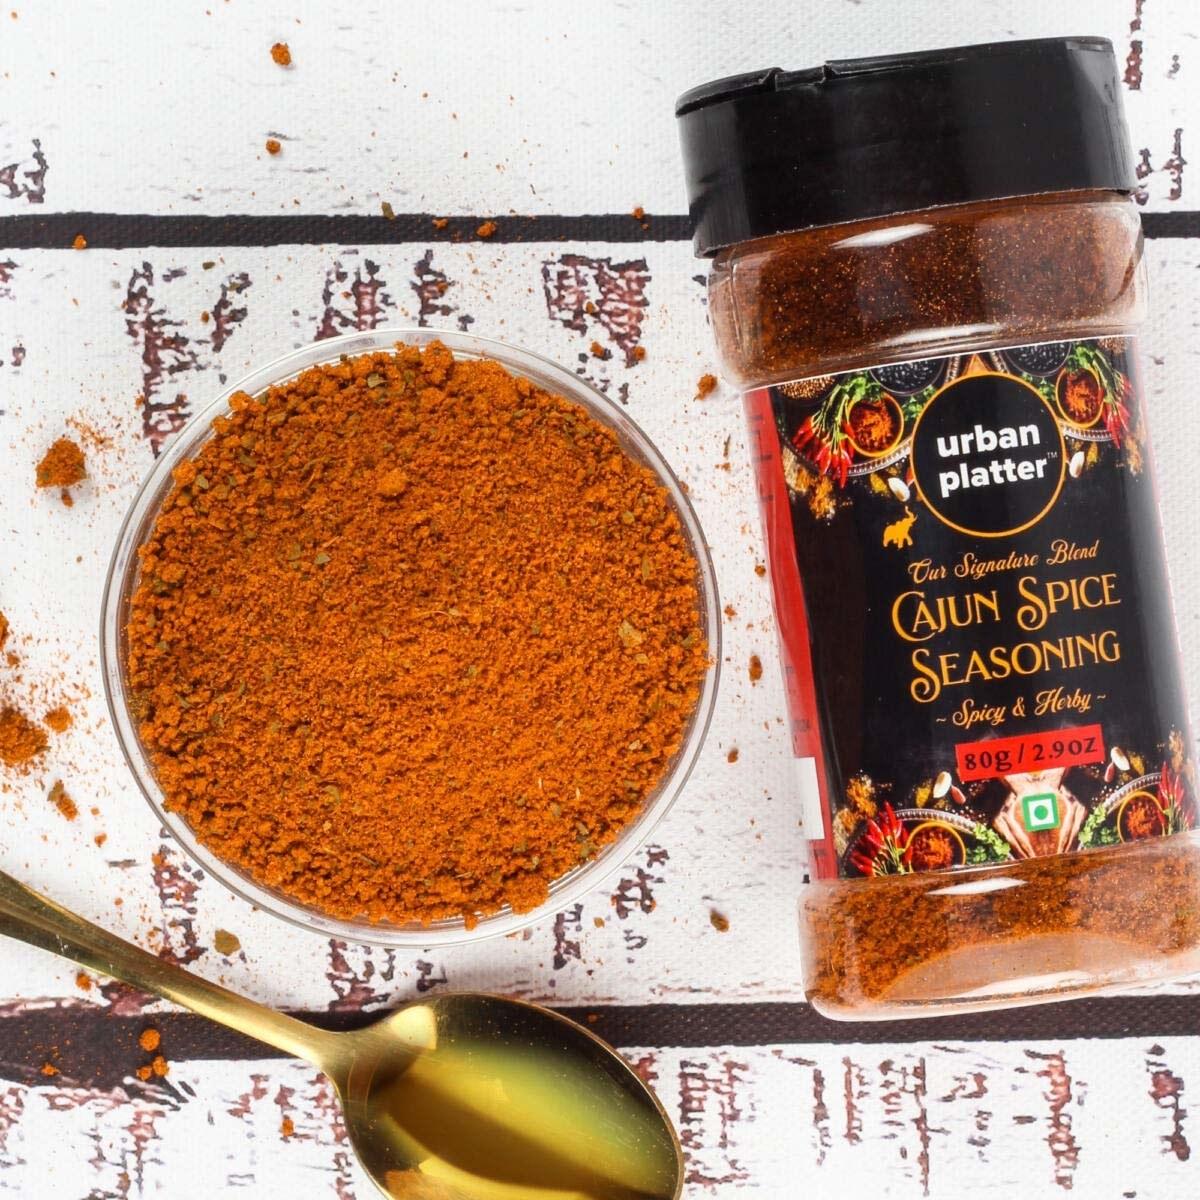 Cajun spice seasoning in a bowl